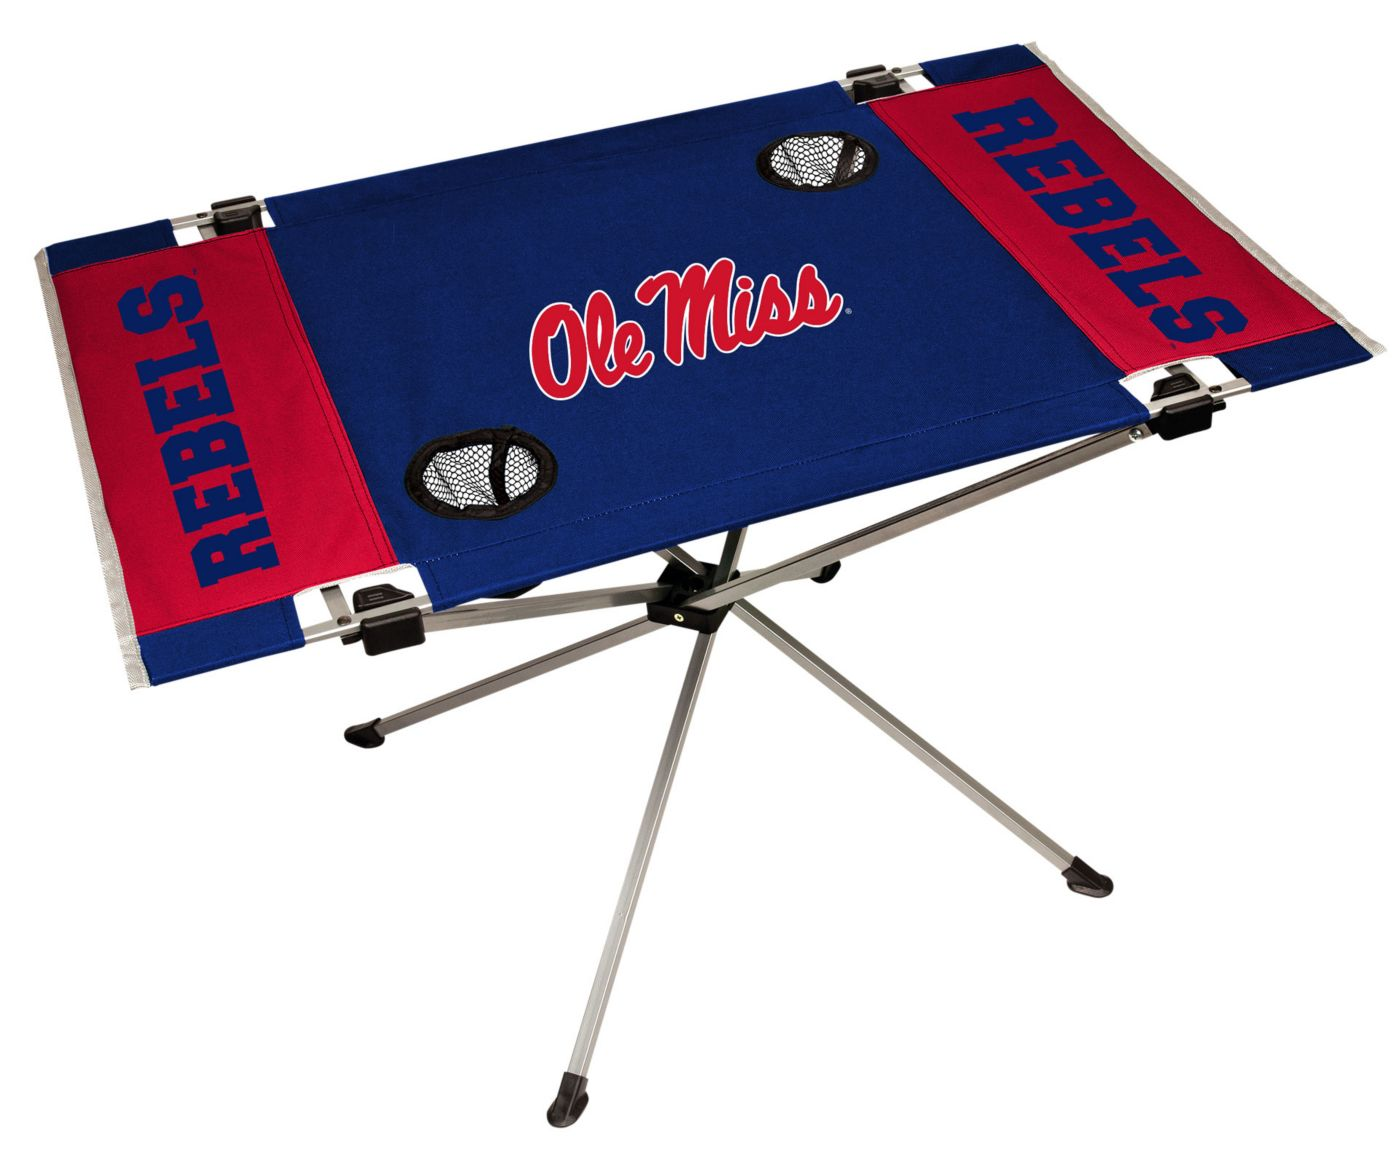 Rawlings Ole Miss Rebels Endzone Table